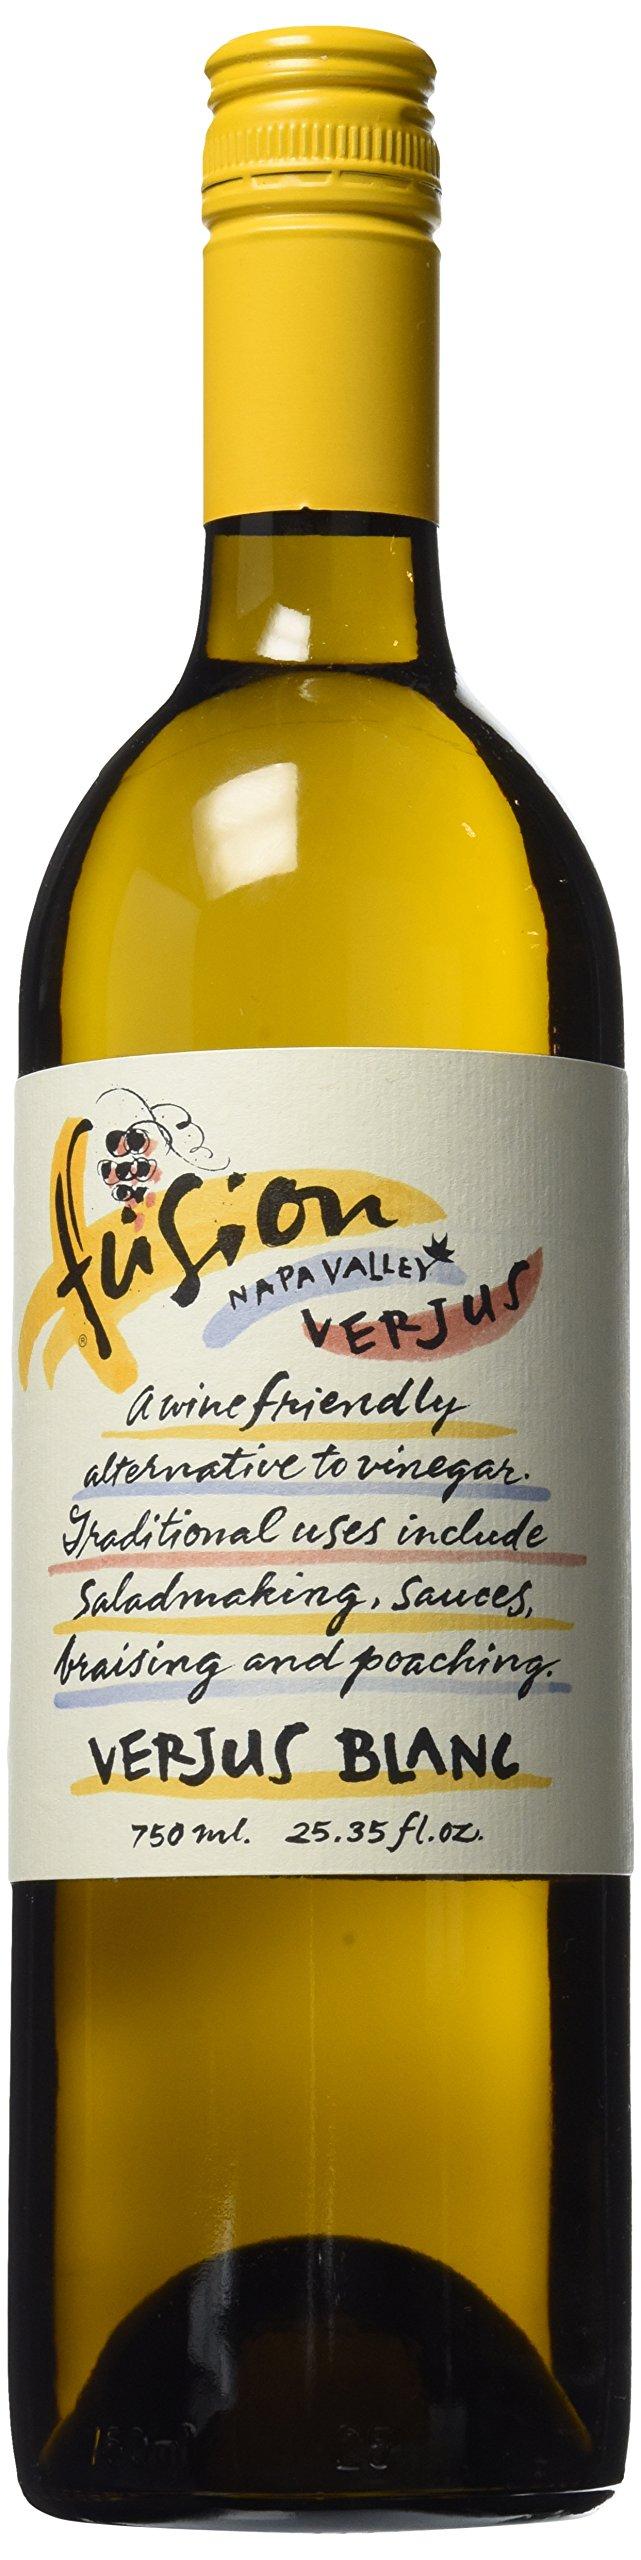 amazon com fusion napa valley verjus rouge juice of unripe